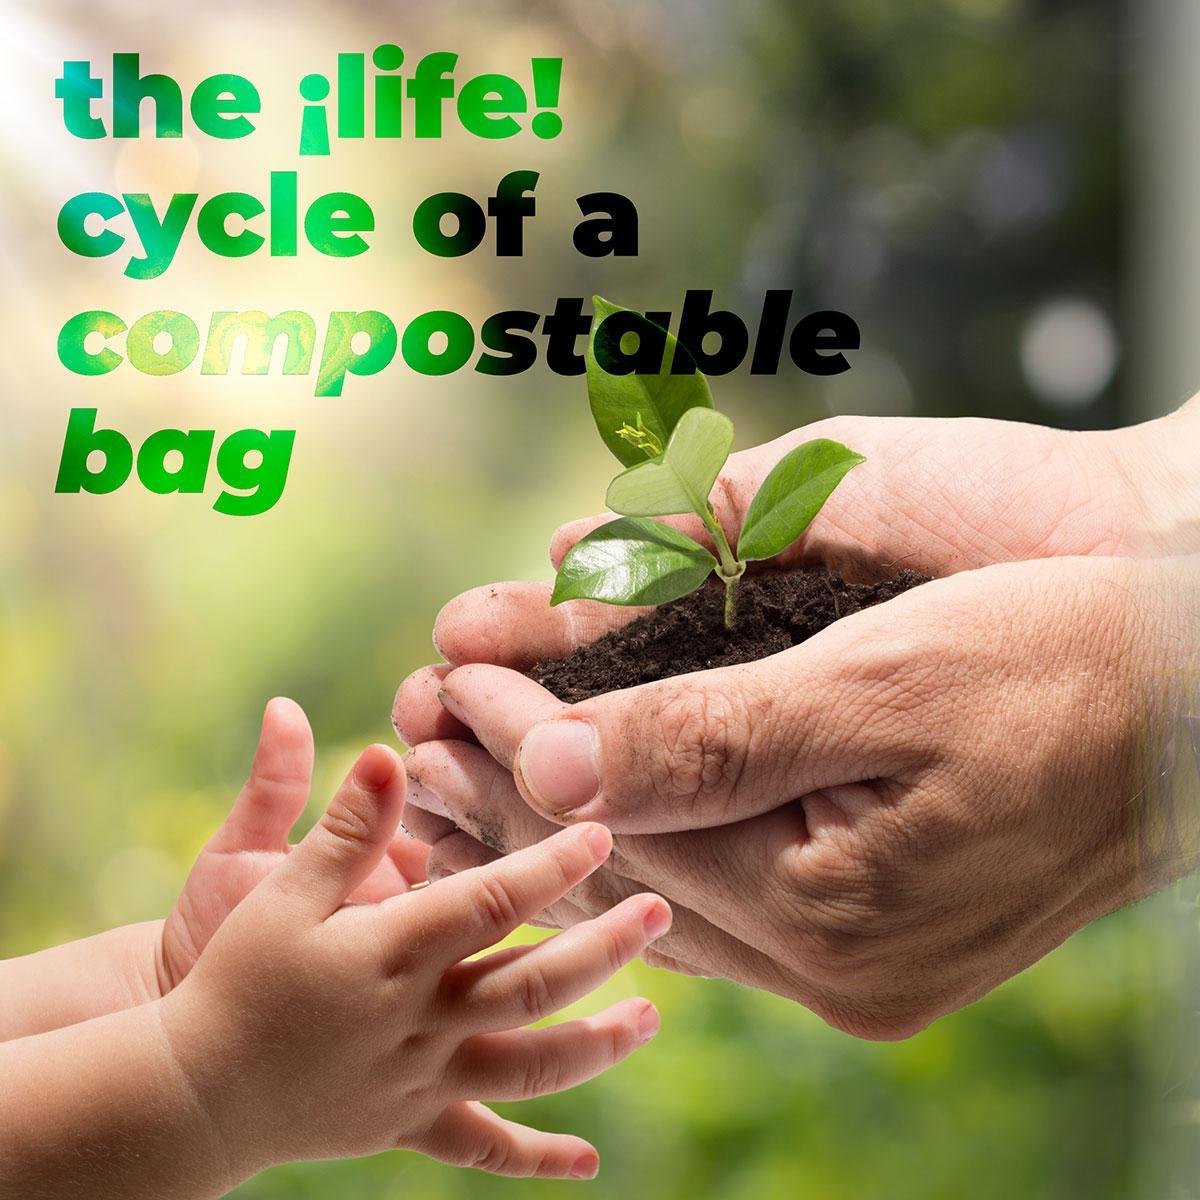 life-cicle-of-a-compostable-bag-0